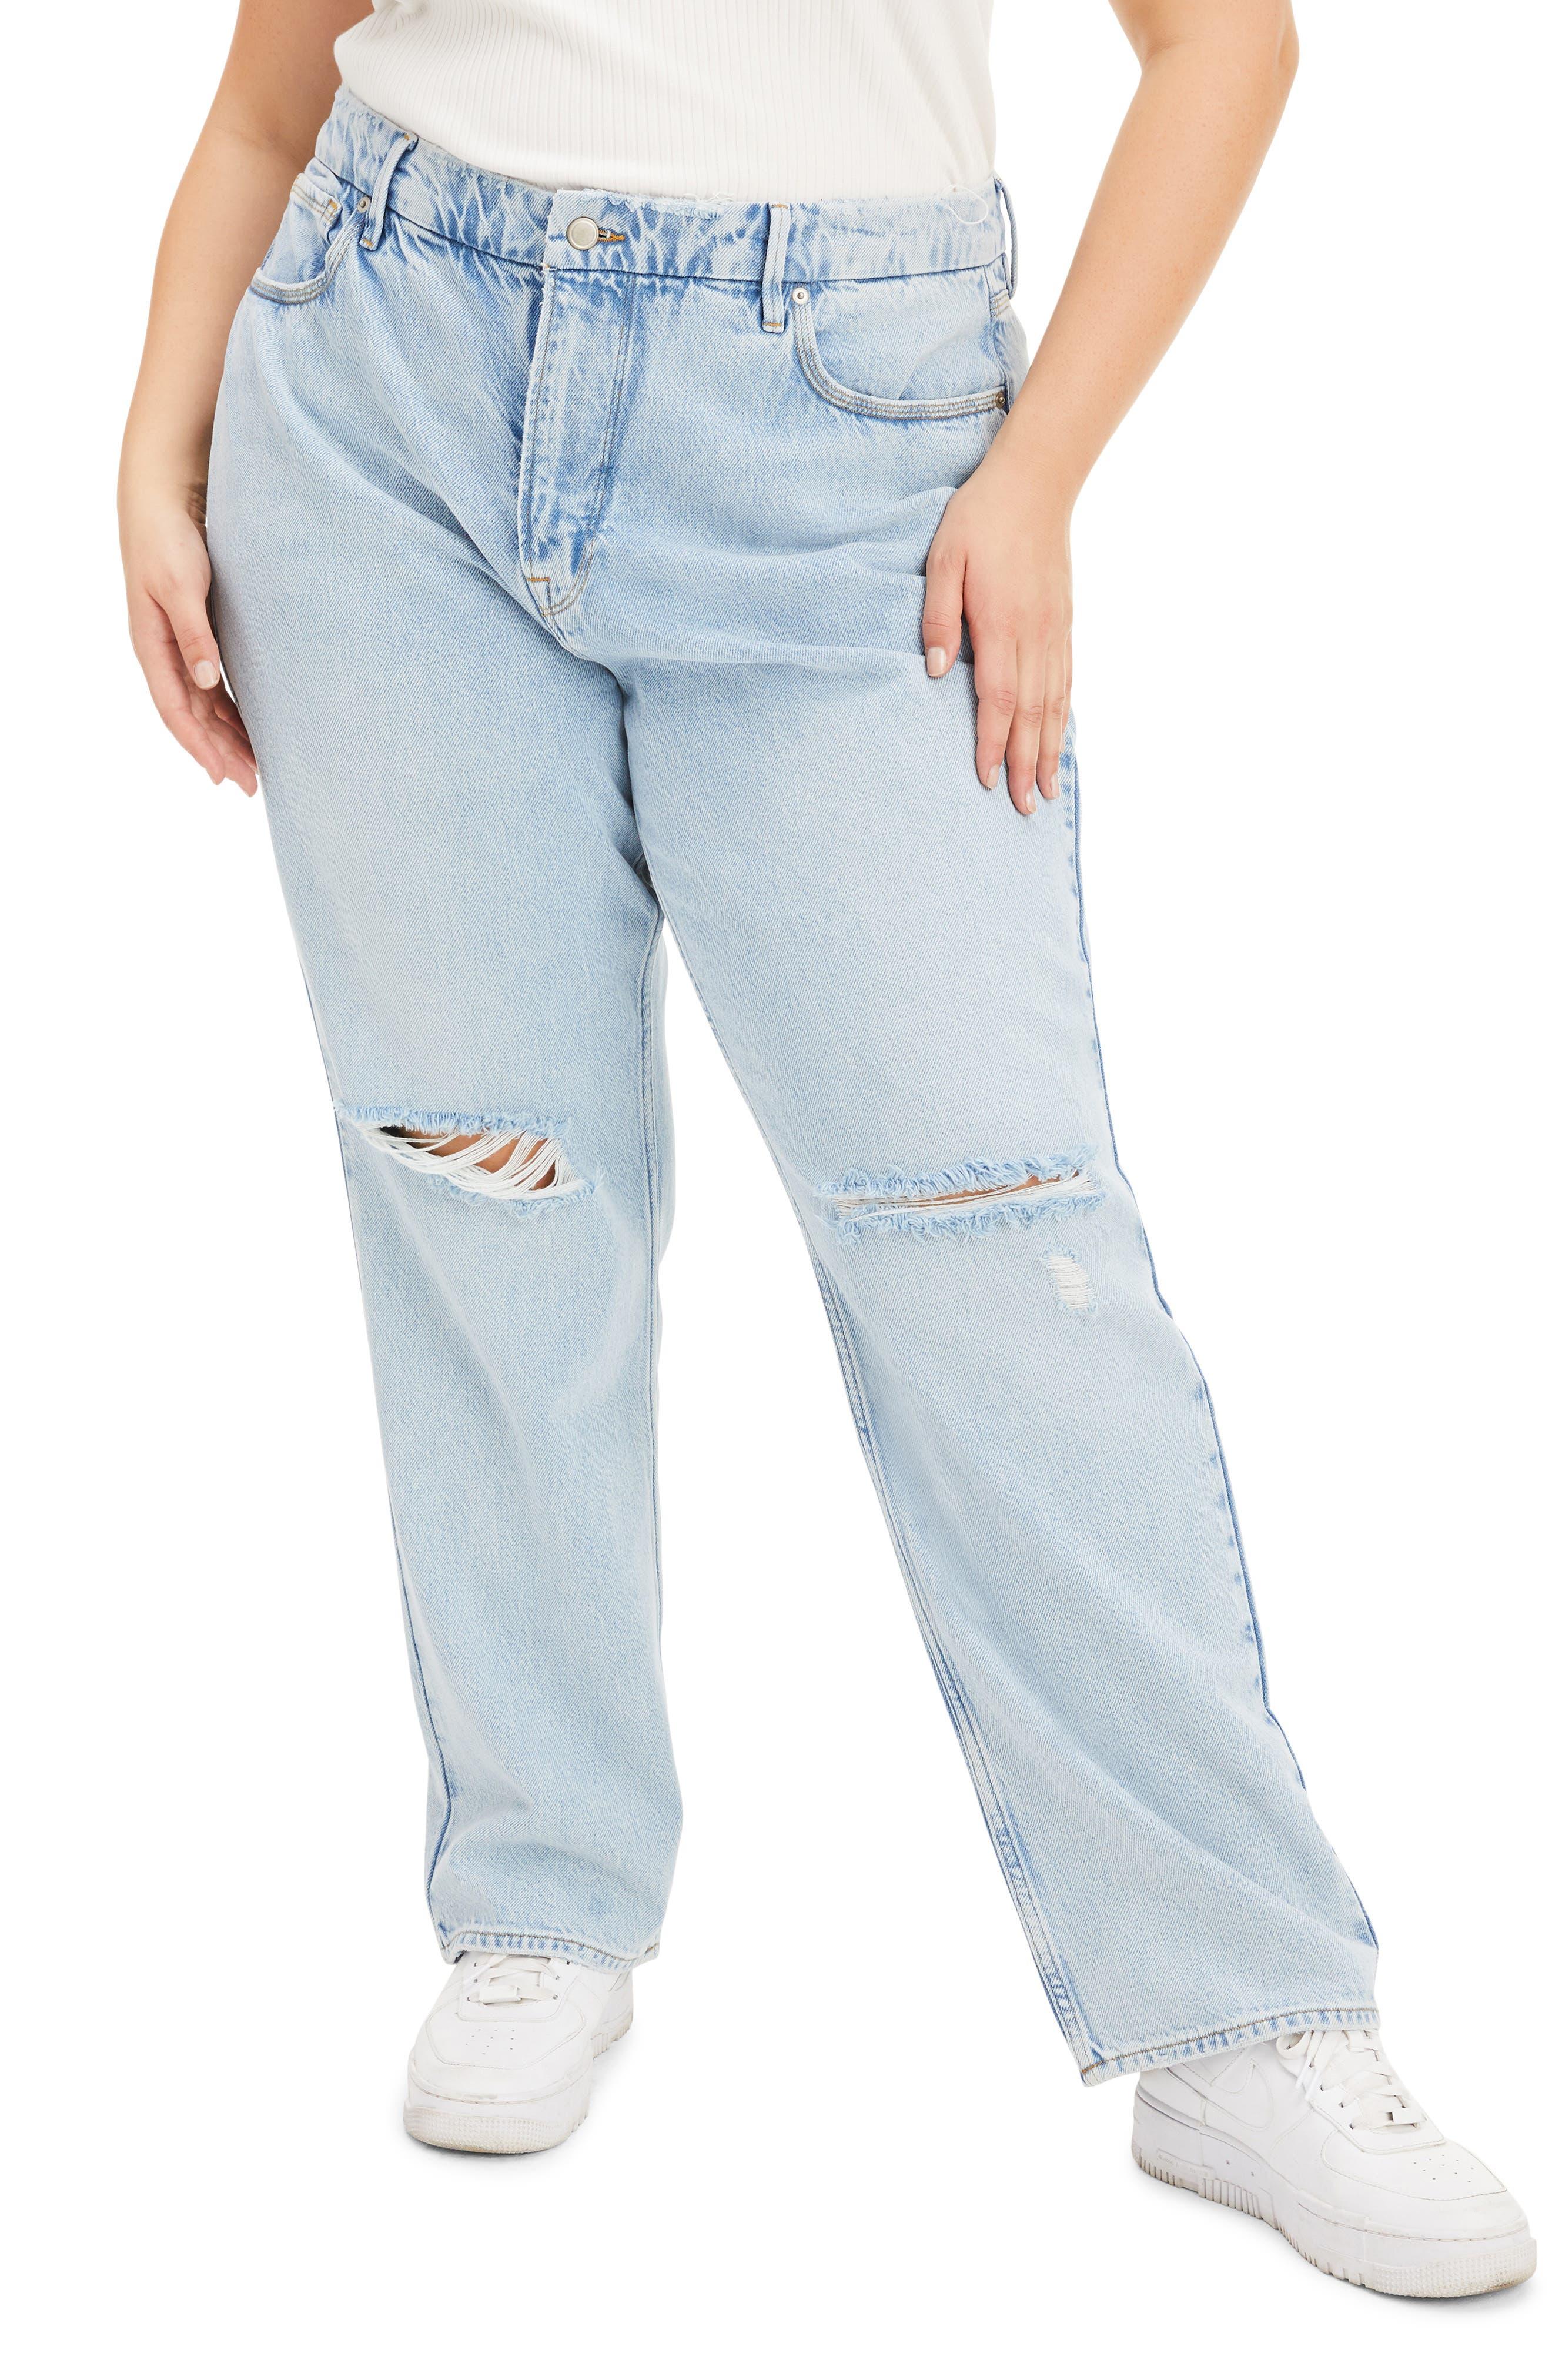 Plus Women's Good American Good '90S Ripped Straight Leg Jeans